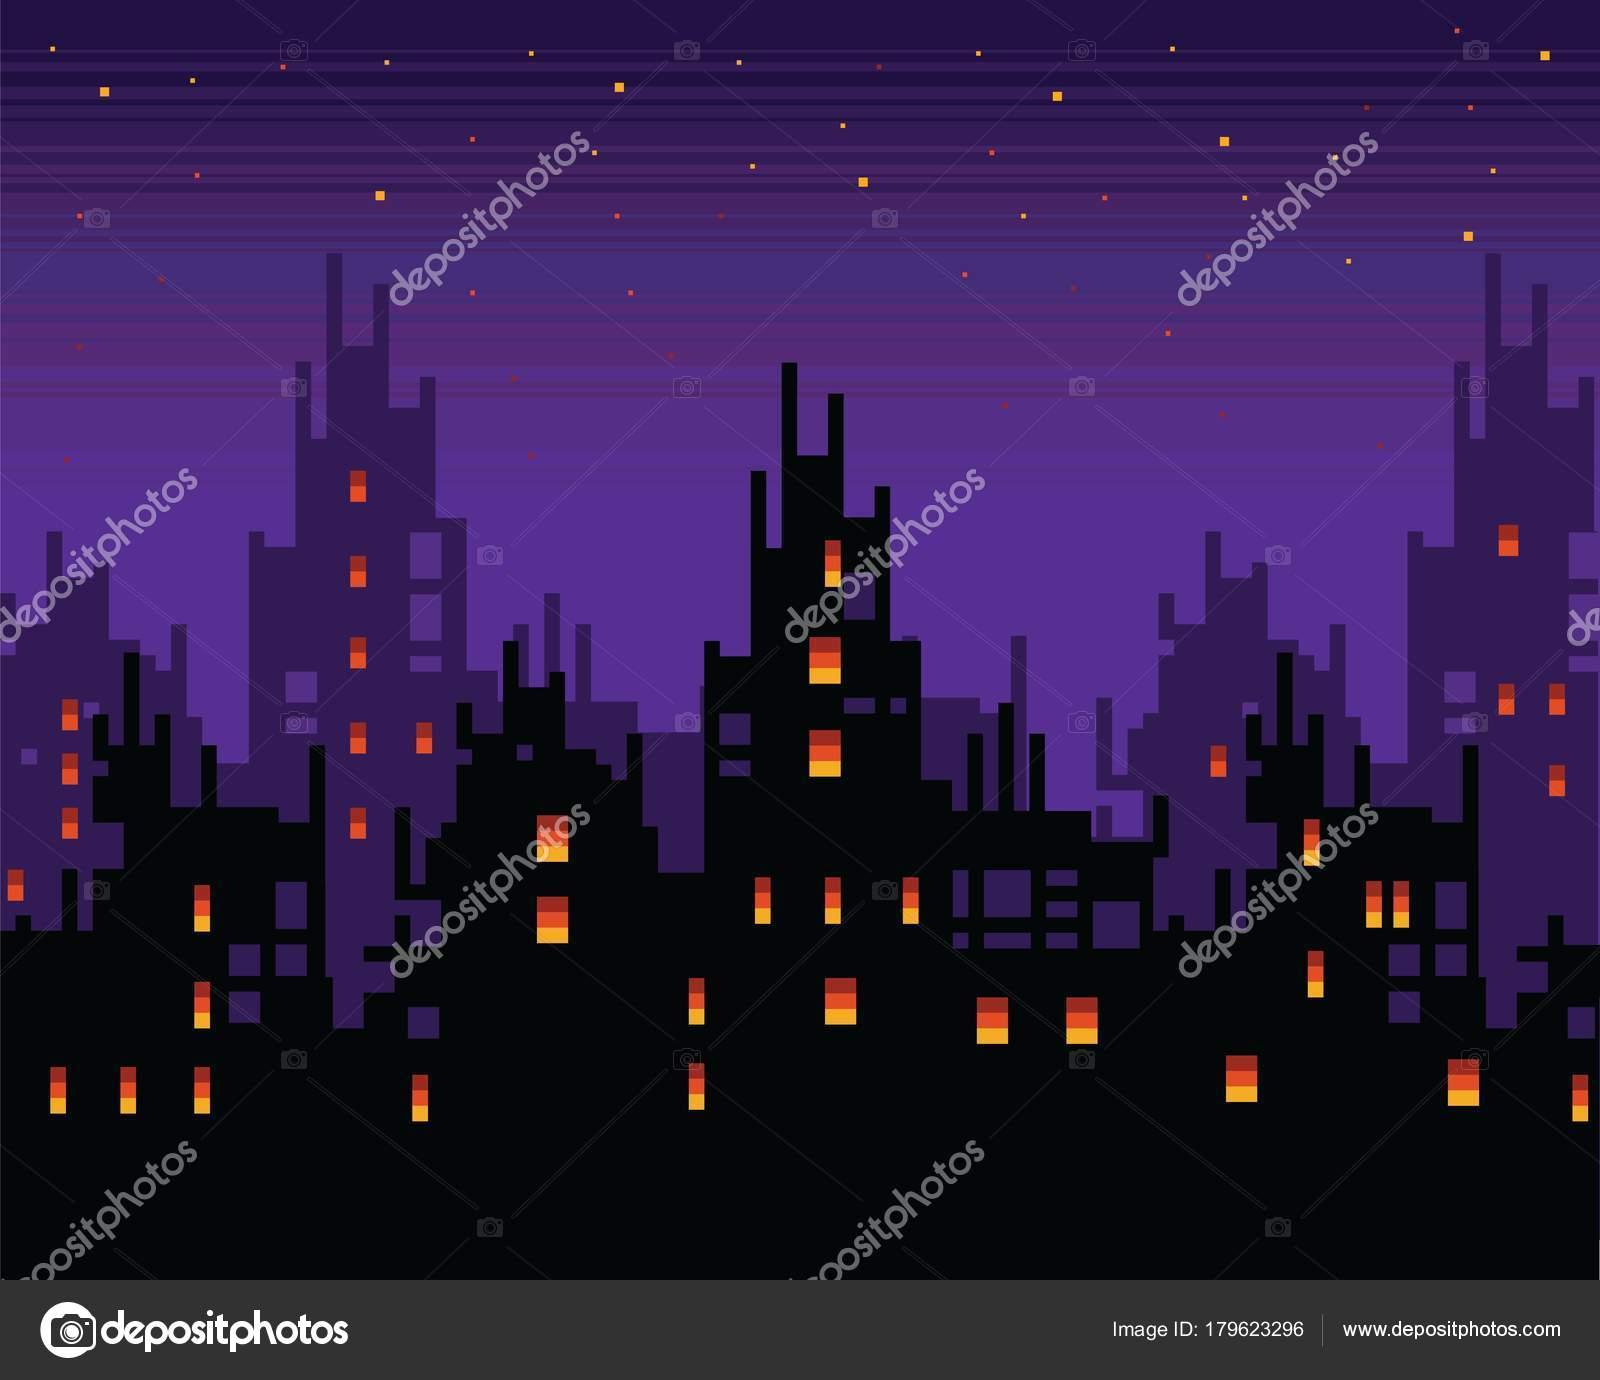 Town Landscape Vector Illustration: Haunted City At Night, Spooky Pixel Art Town Landscape